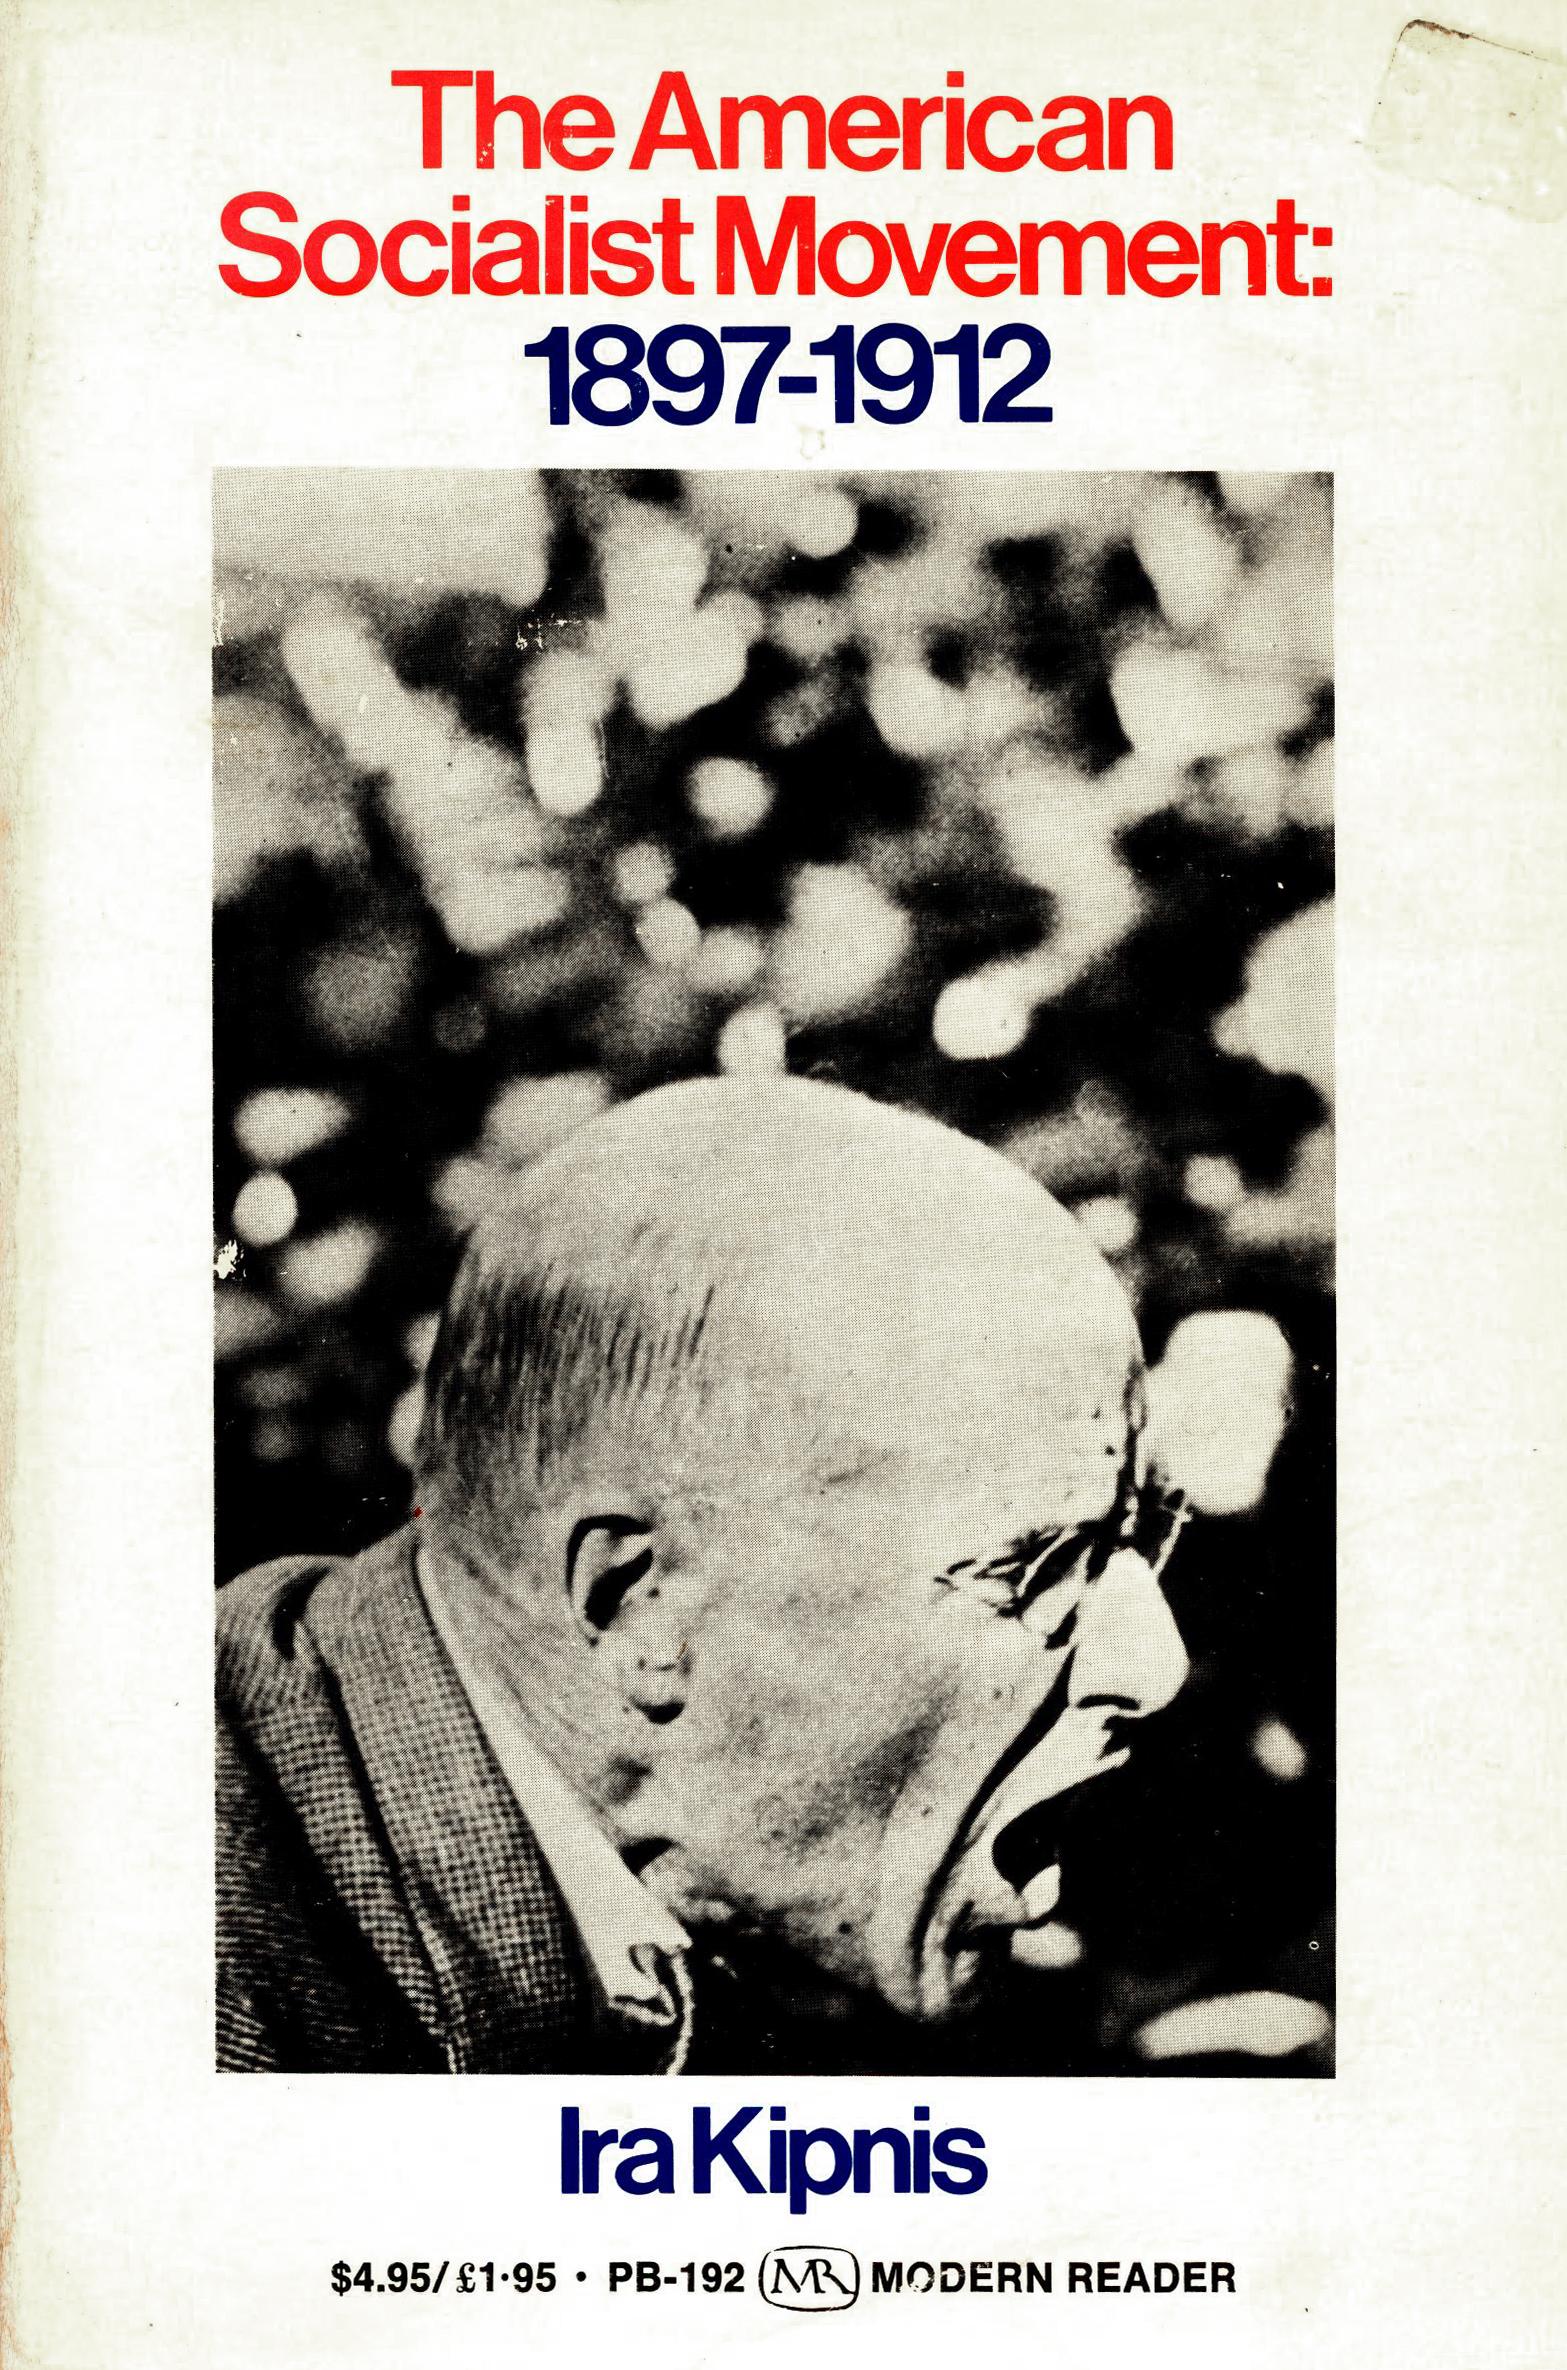 Ira Kipnis: The American Socialist Movement 1897-1912